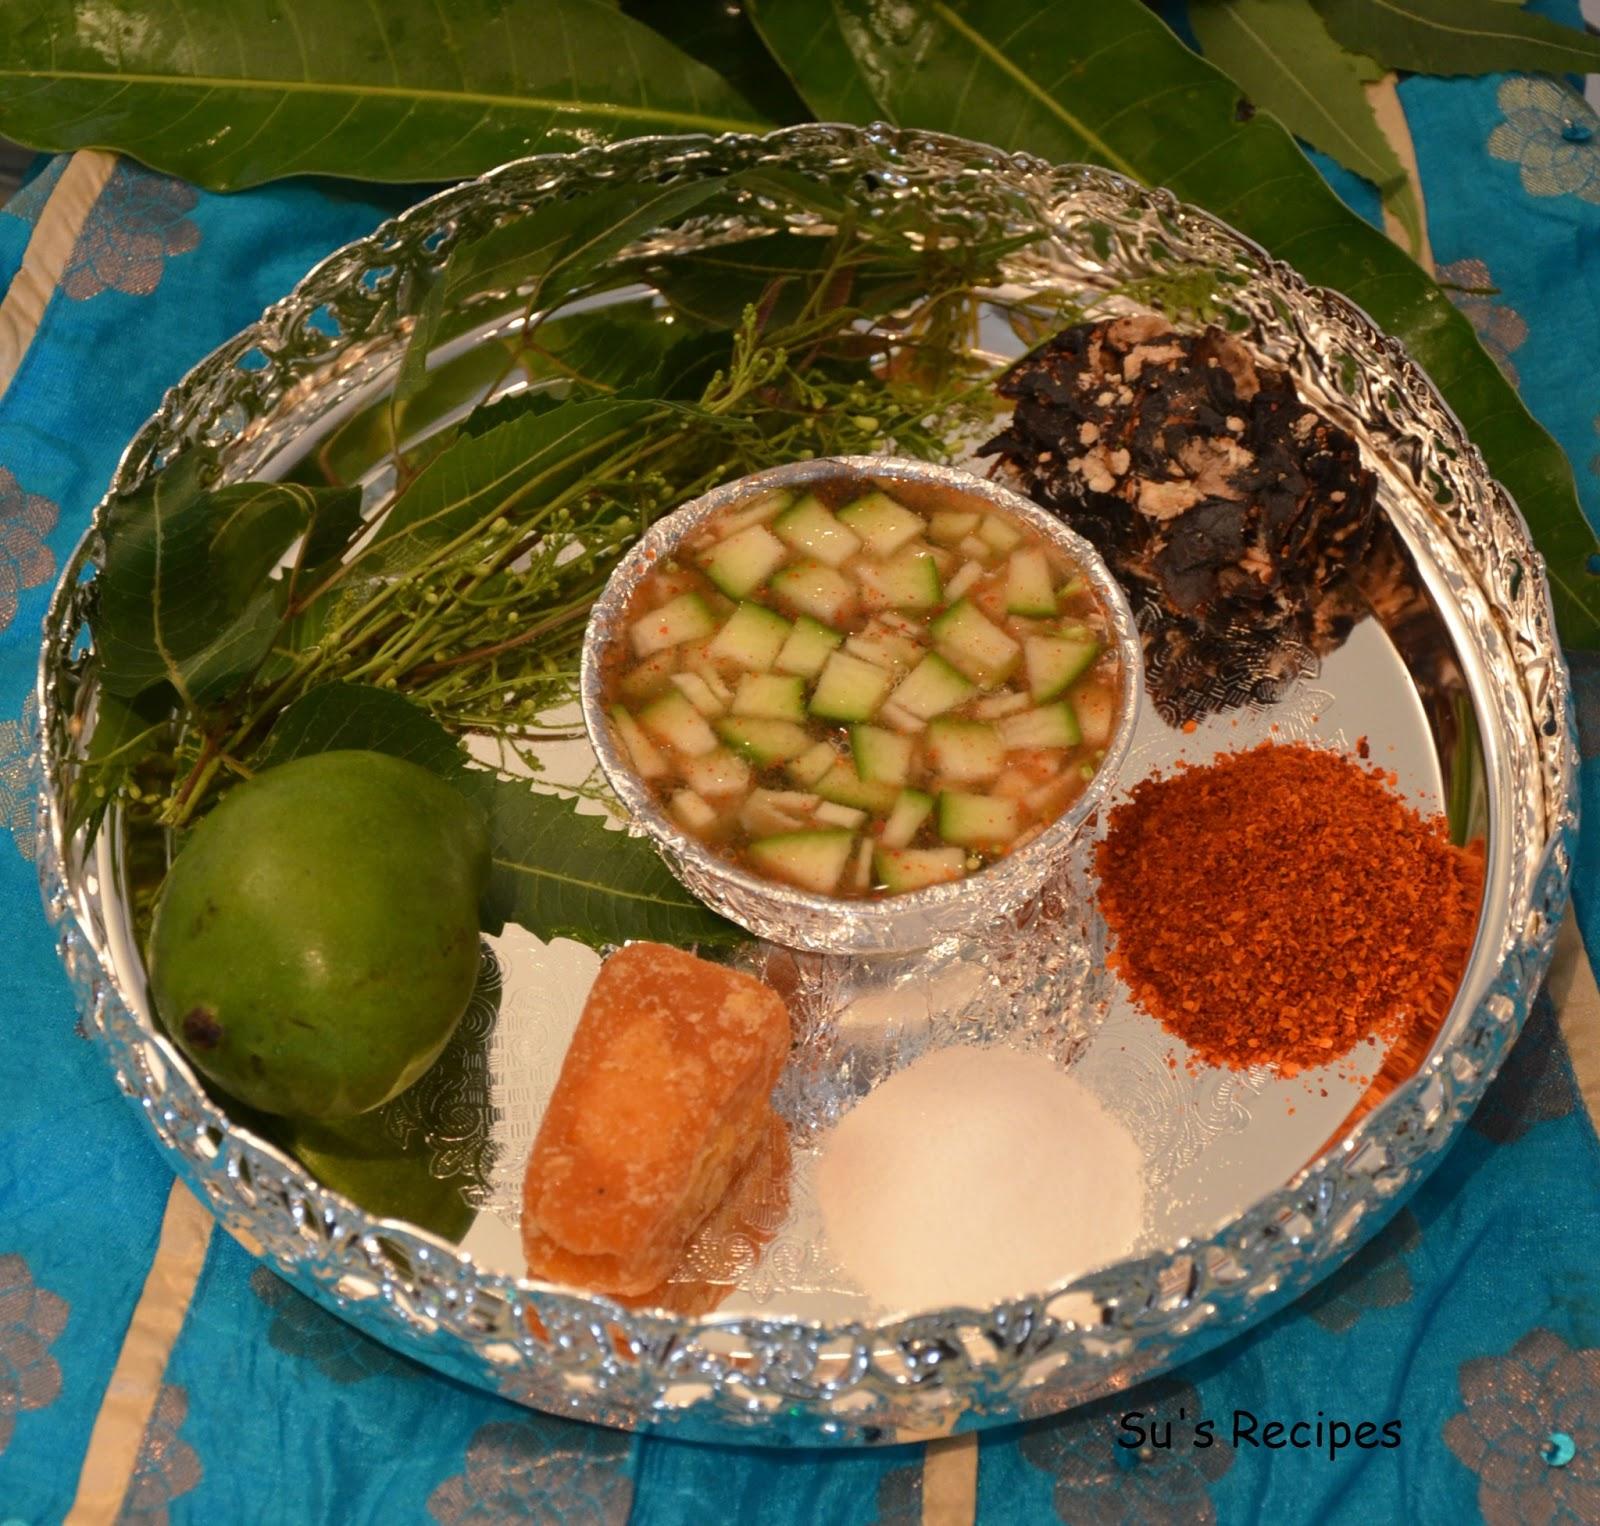 Sus recipes ugadi pachadi ugadi pachidi ugadi prasad mix of 6 taste forumfinder Choice Image